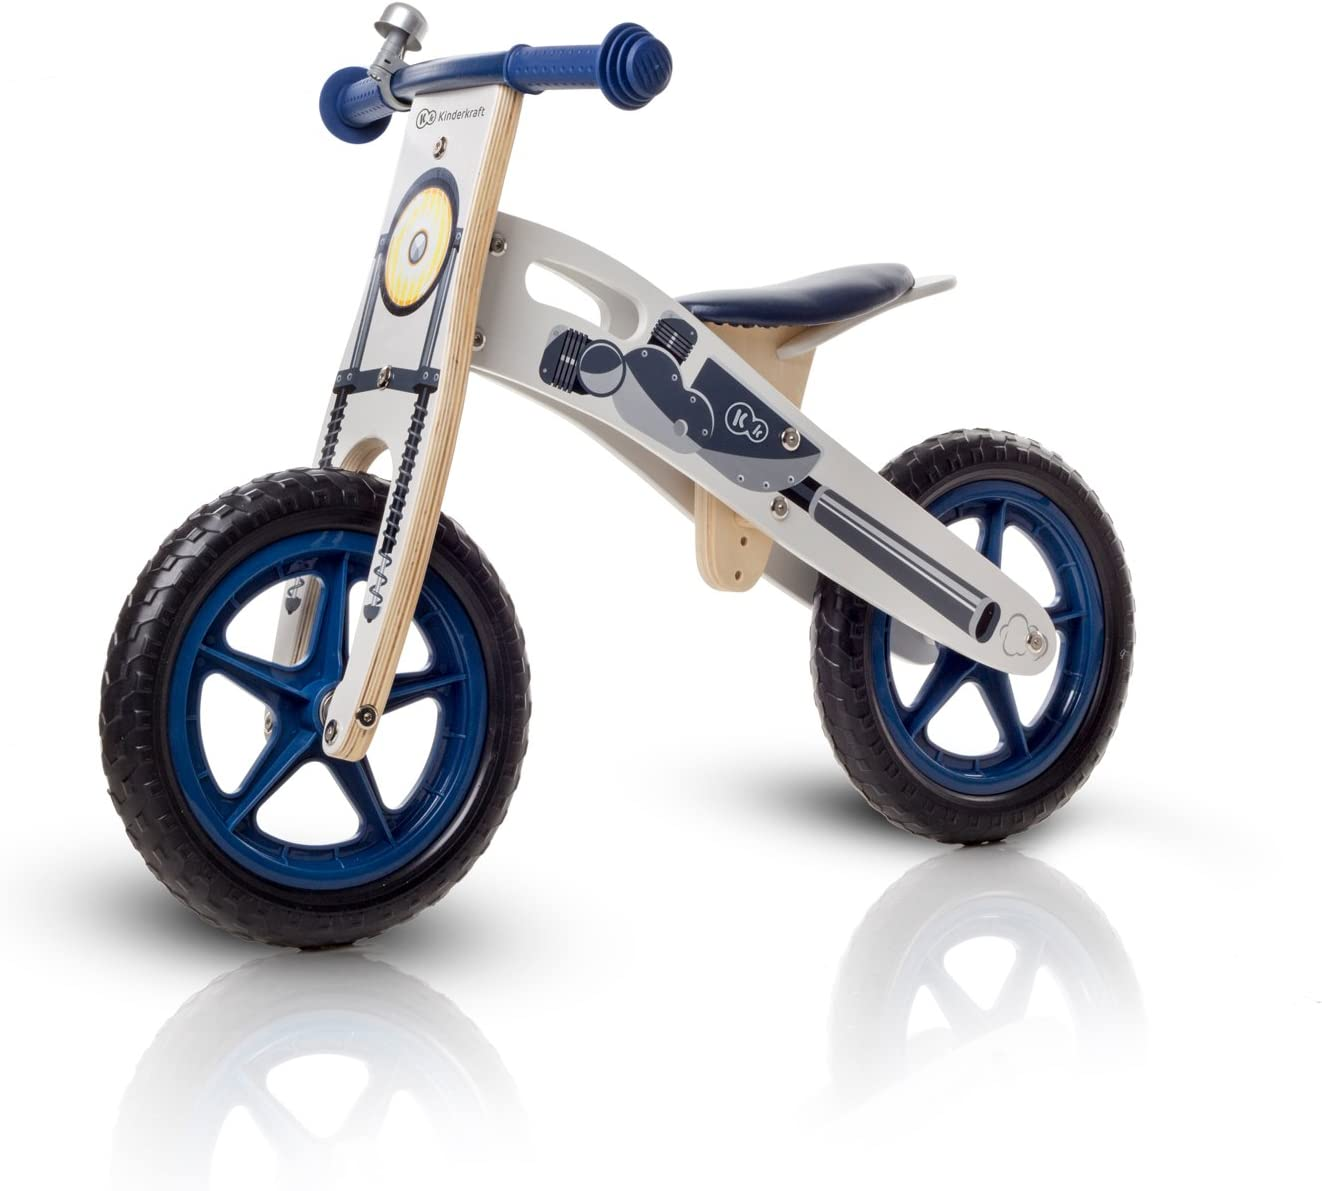 KinderKraft Niños Fuerza Runner Bicicleta de Madera sin Pedales ...